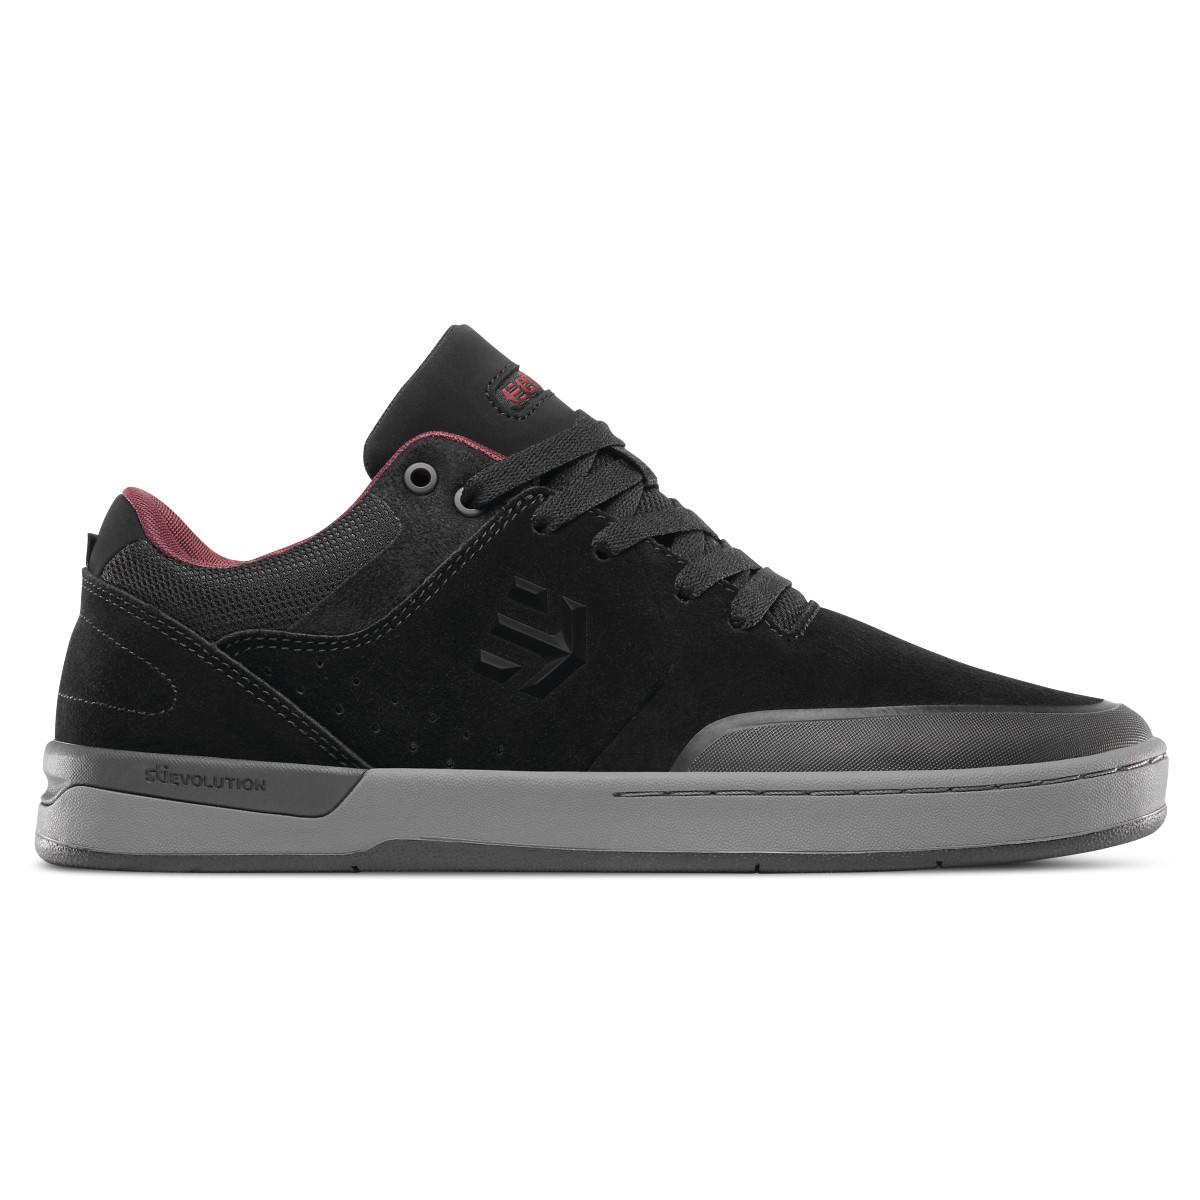 6a5fccc8cc ... Etnies Skateboard Shoes Marana XT Sheckler Black Grey Red. Image 1.  Click to enlarge